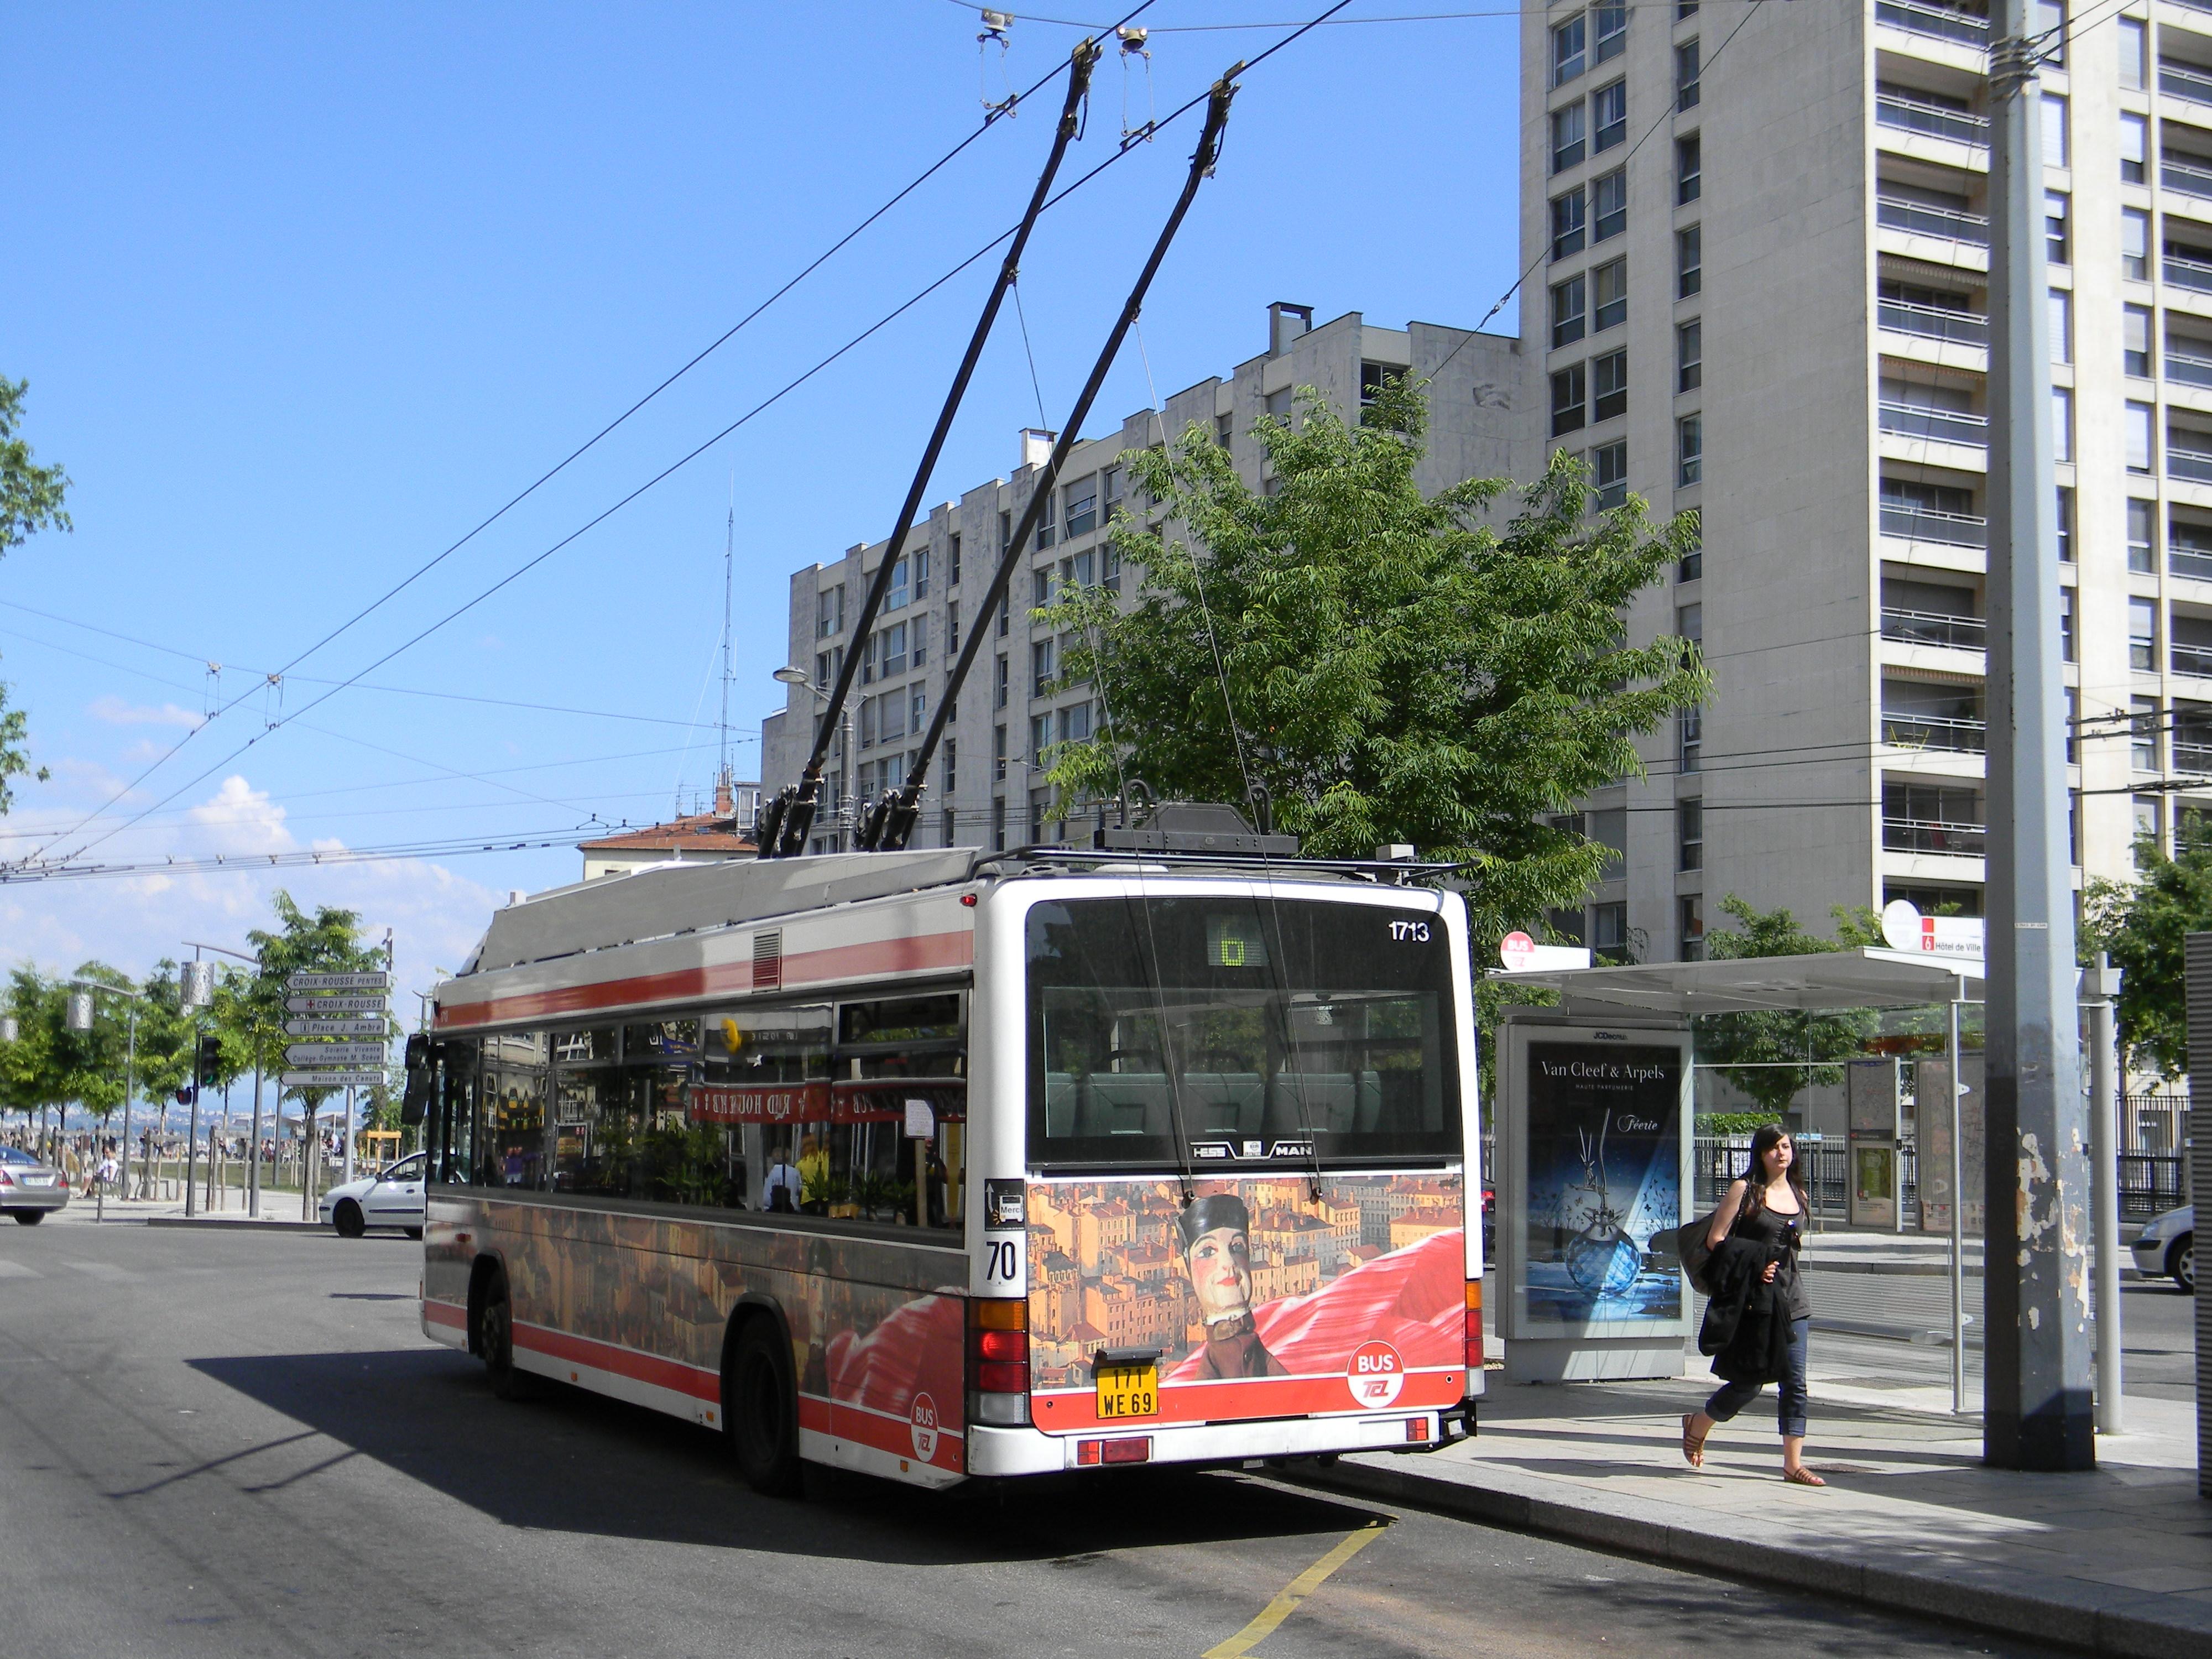 Fichier bus 6 croix rousse lyon jpg wikip dia - Lyon to geneva bus ...